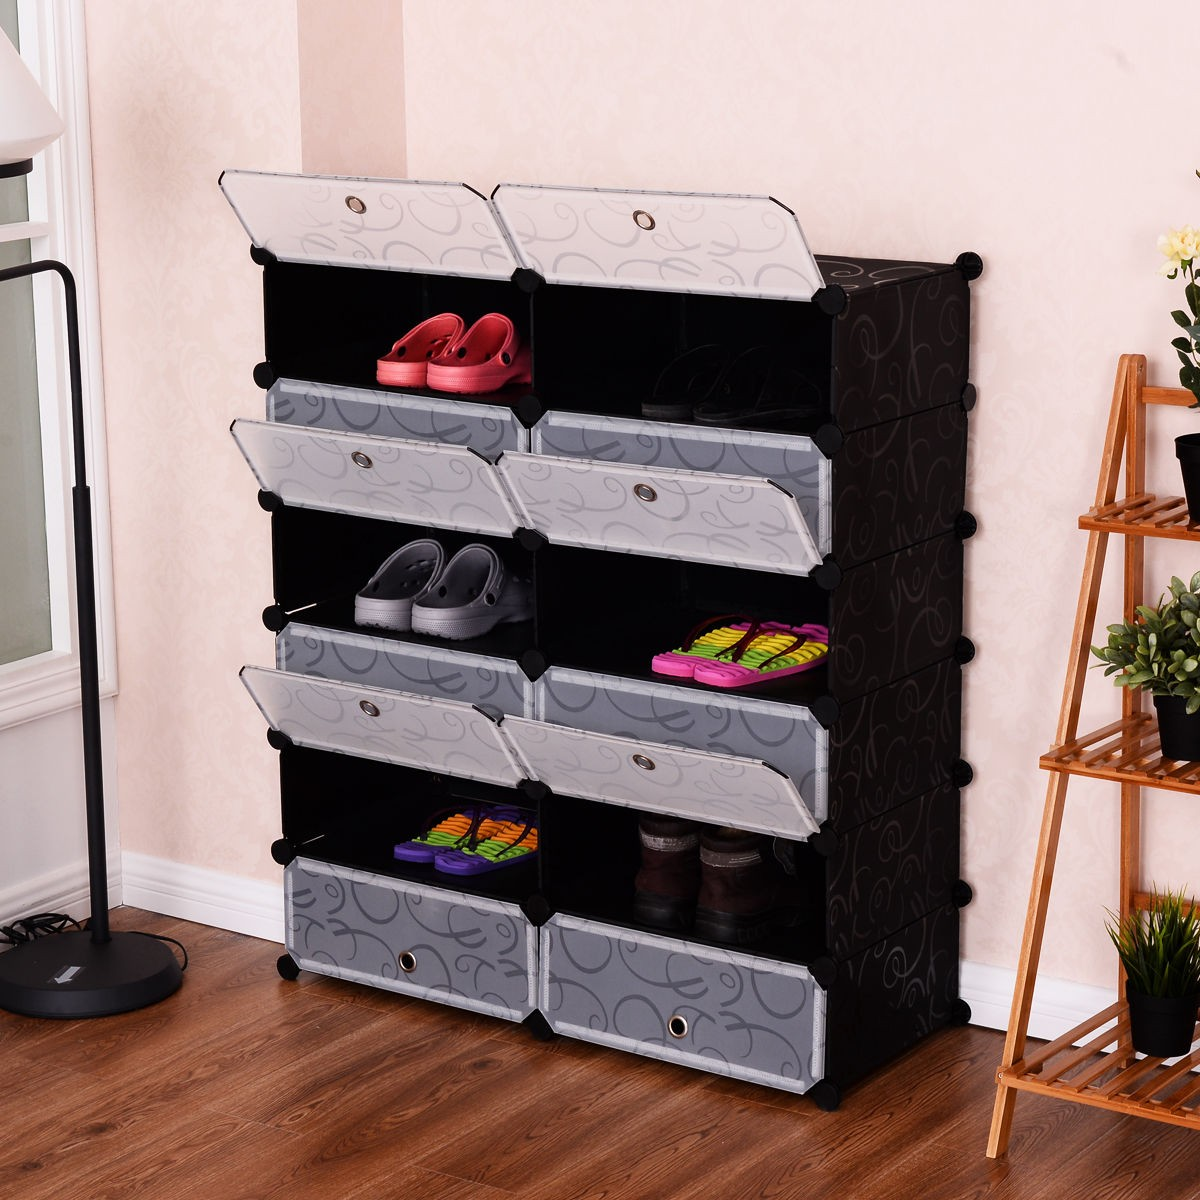 Living Room 12 Cubes Shoes Pp Rack Shelf Storage Cabinet Closet Container Ebay